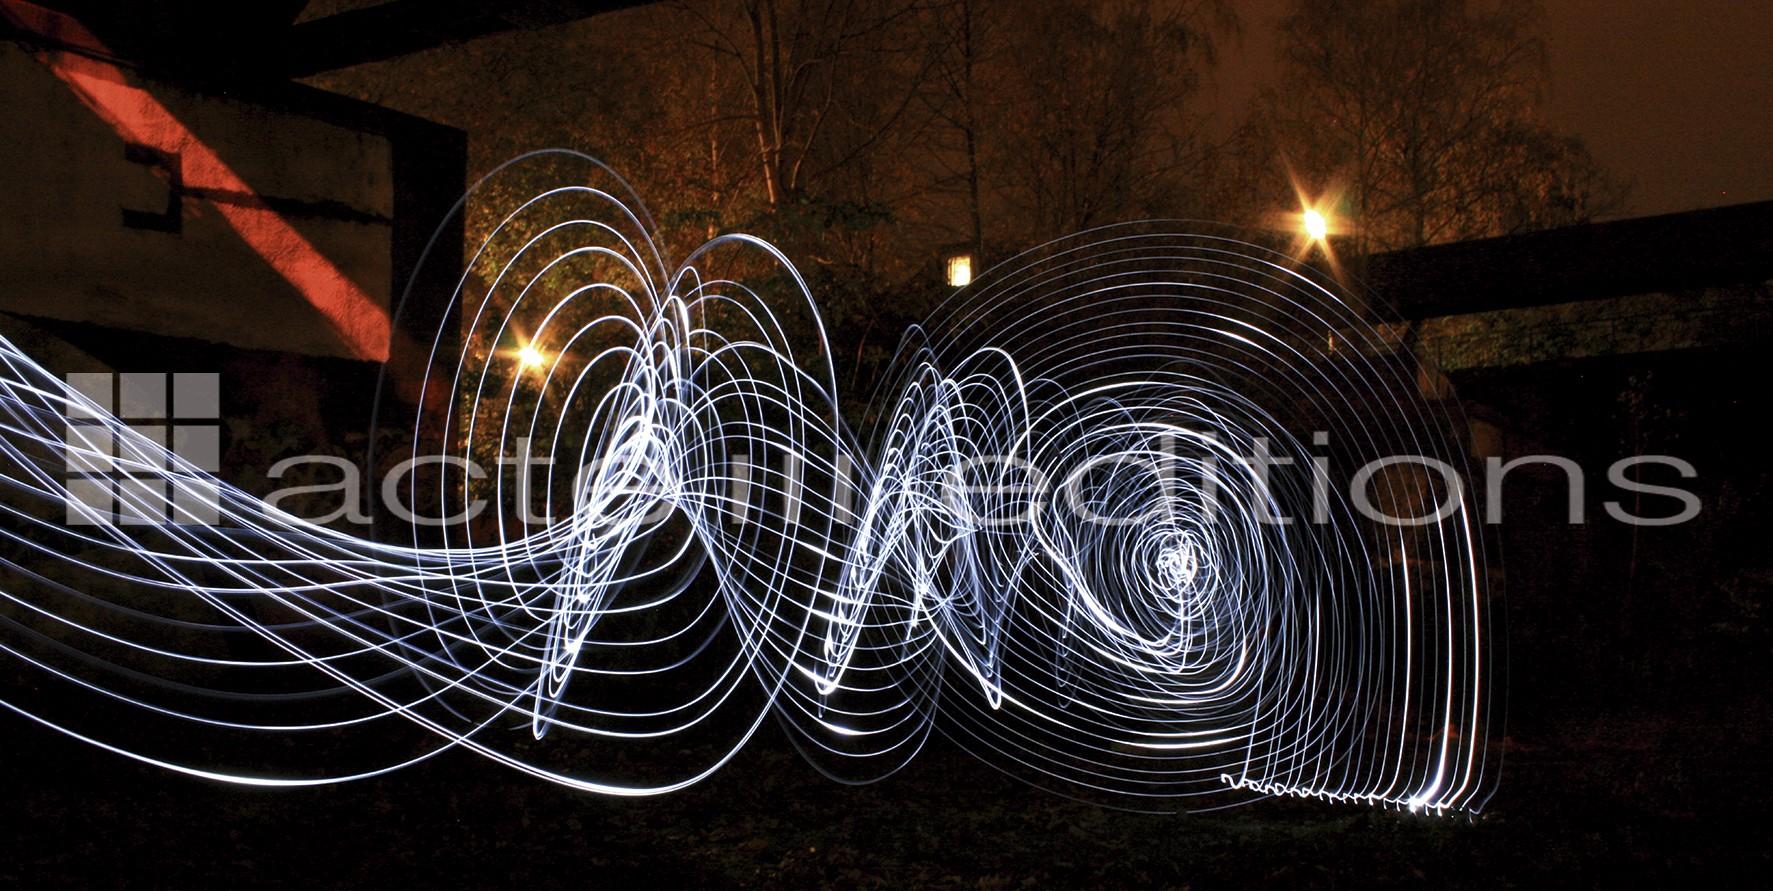 Night moves, 2012